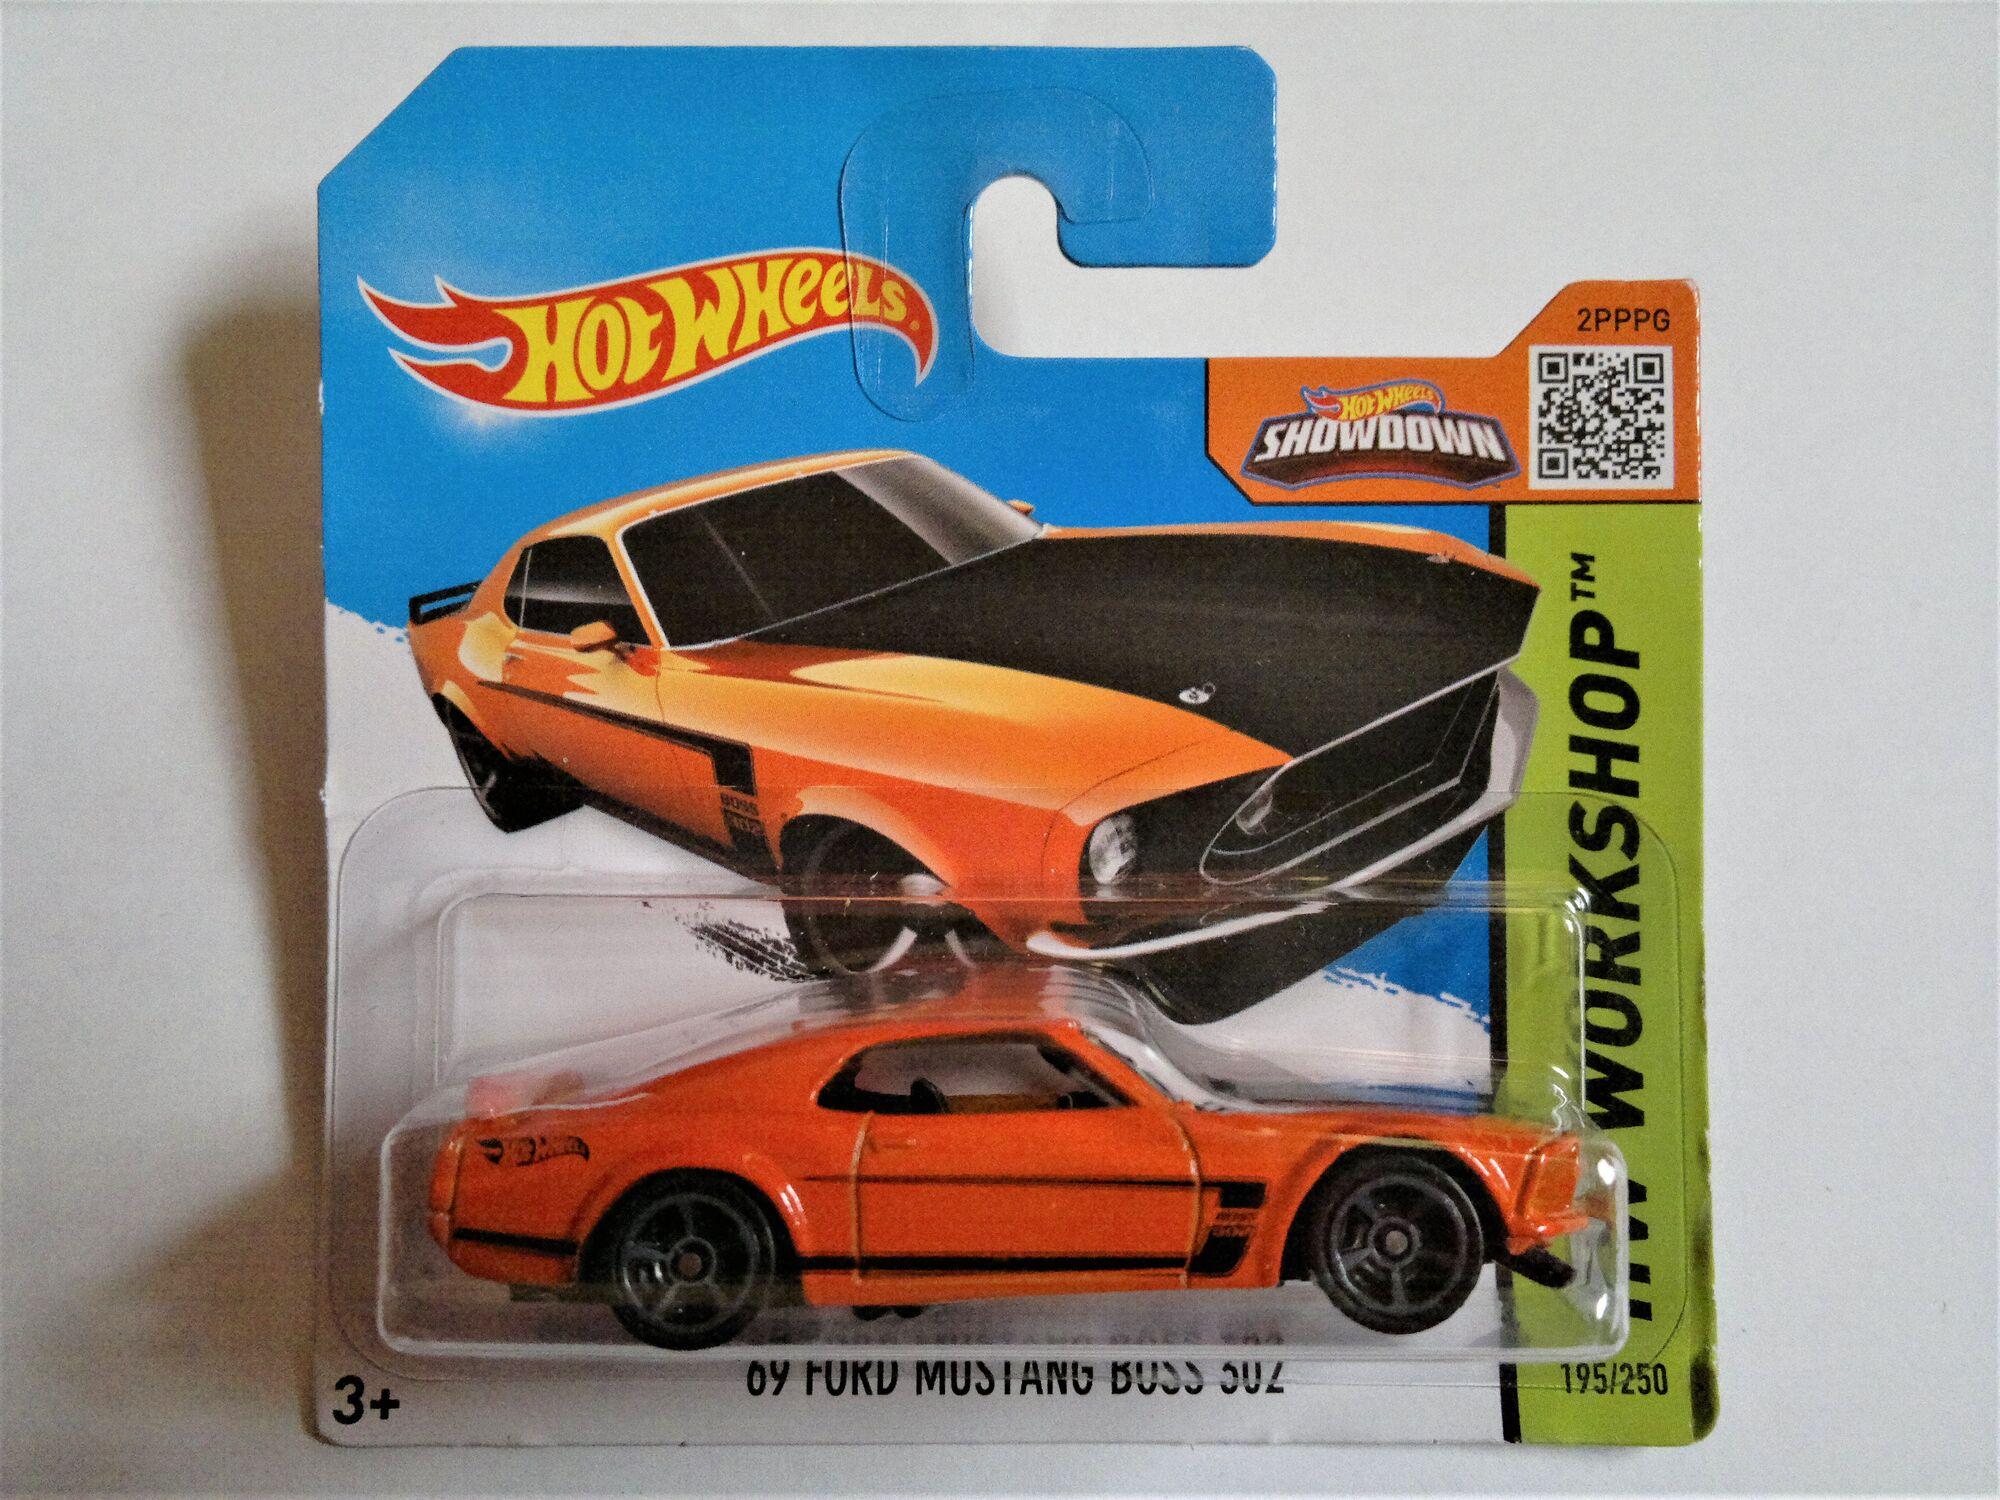 1969 /'69 FORD MUSTANG BOSS 302 GULF CAR CULTURE PREMIUM HOT WHEELS DIECAST 2018